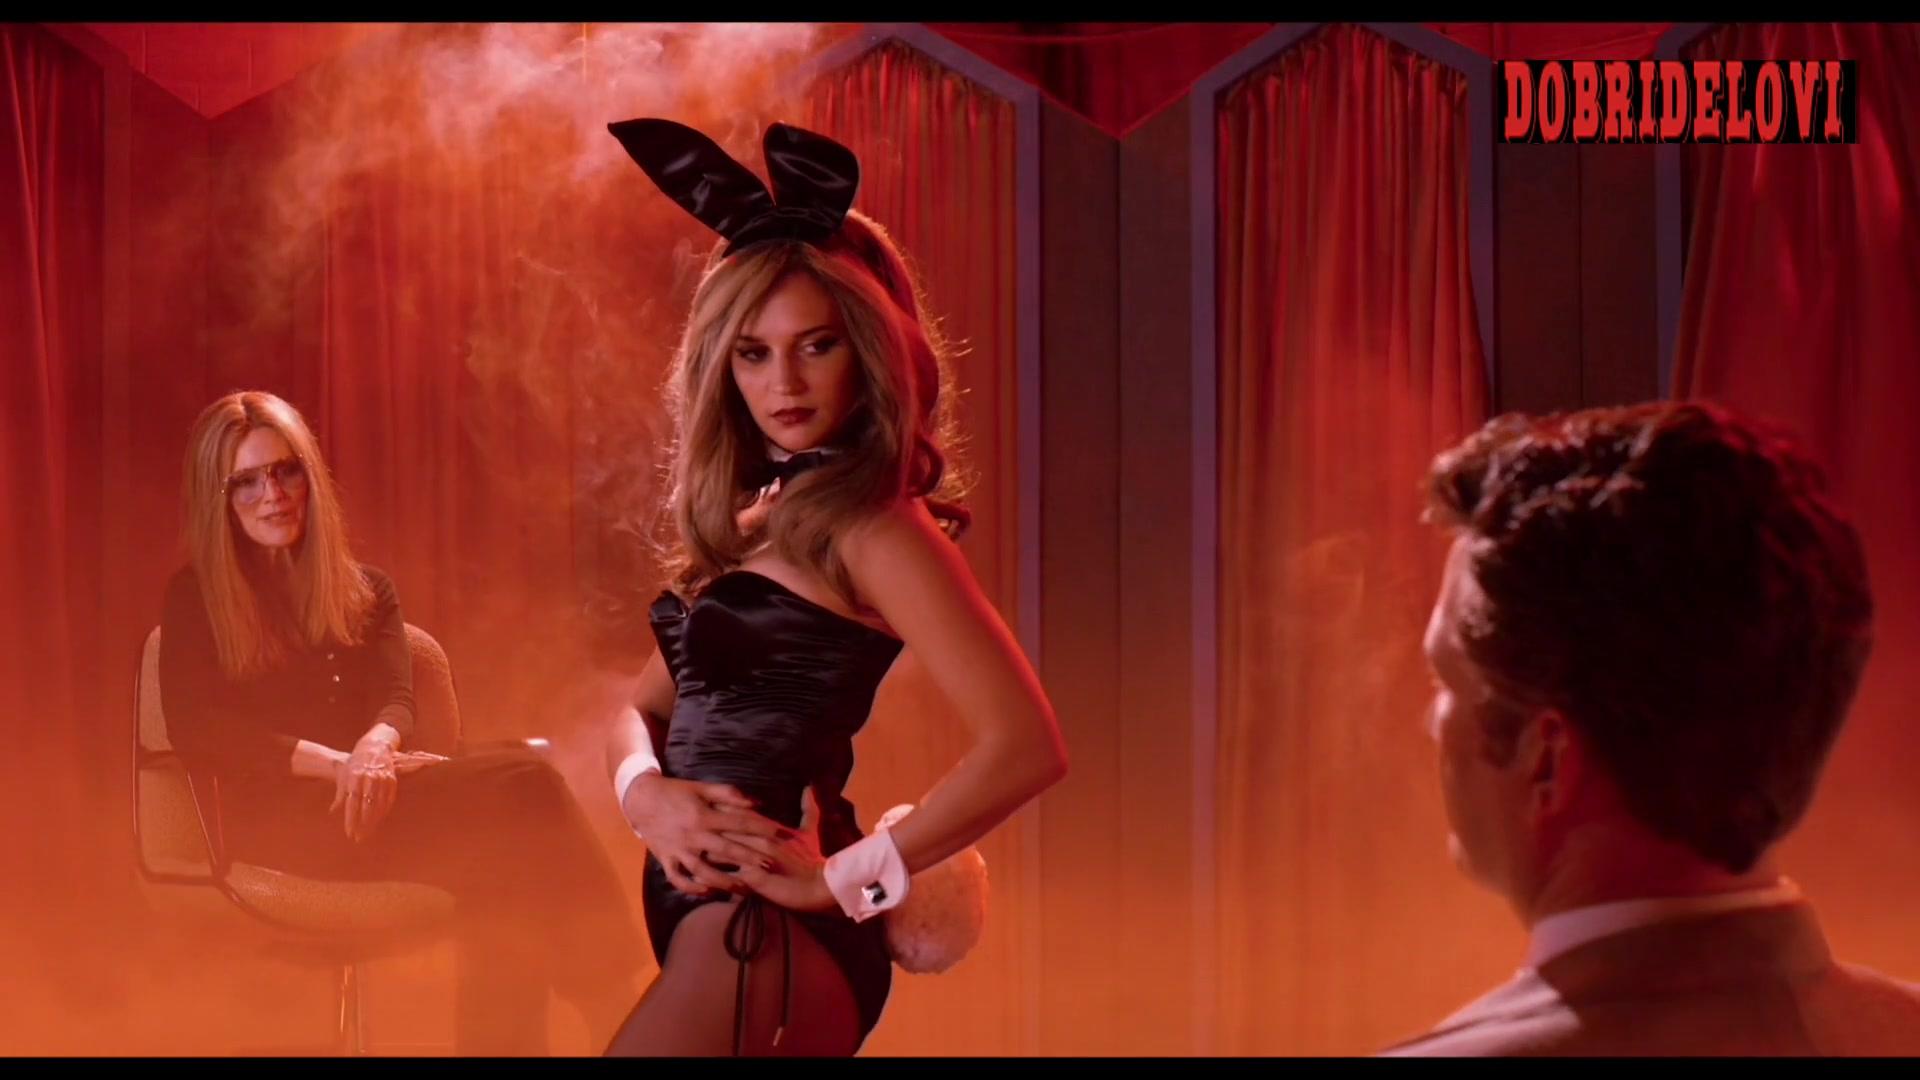 Alicia Vikander playboy bunny in dream scene from The Glorias